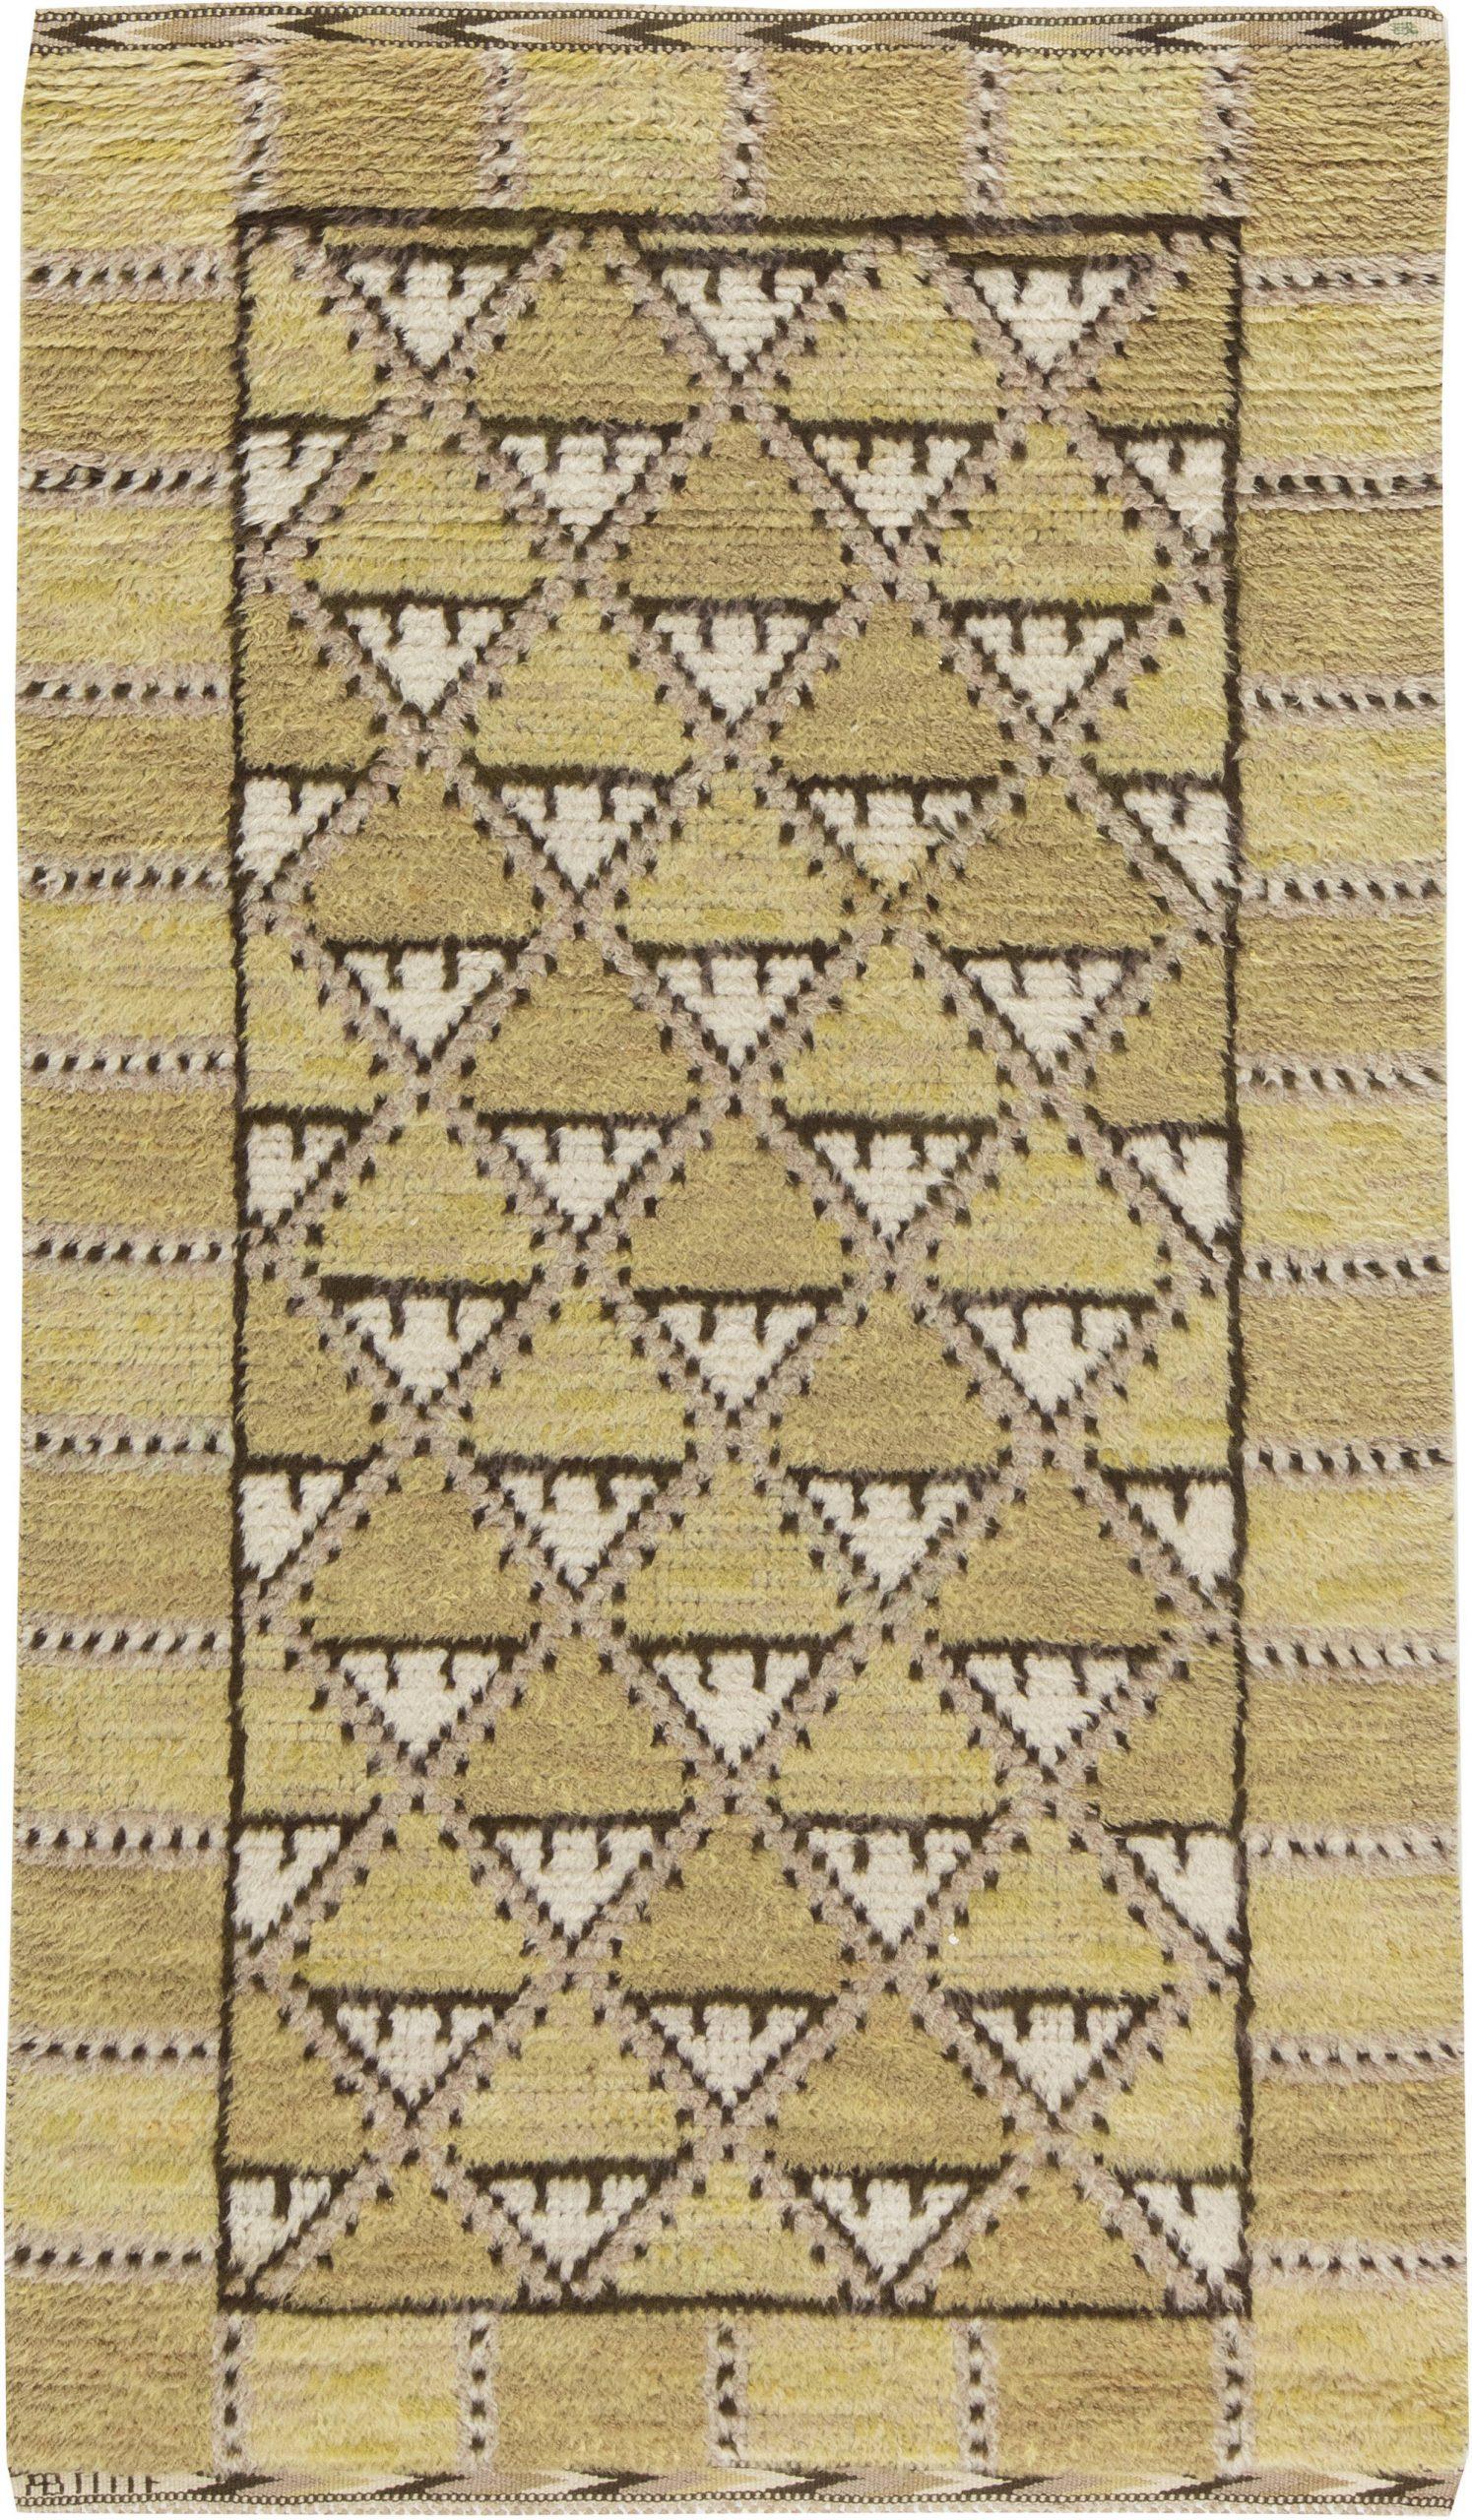 Vintage Swedish Pile weave Rug  by  Marta Maas Fjetterstrom BB6291